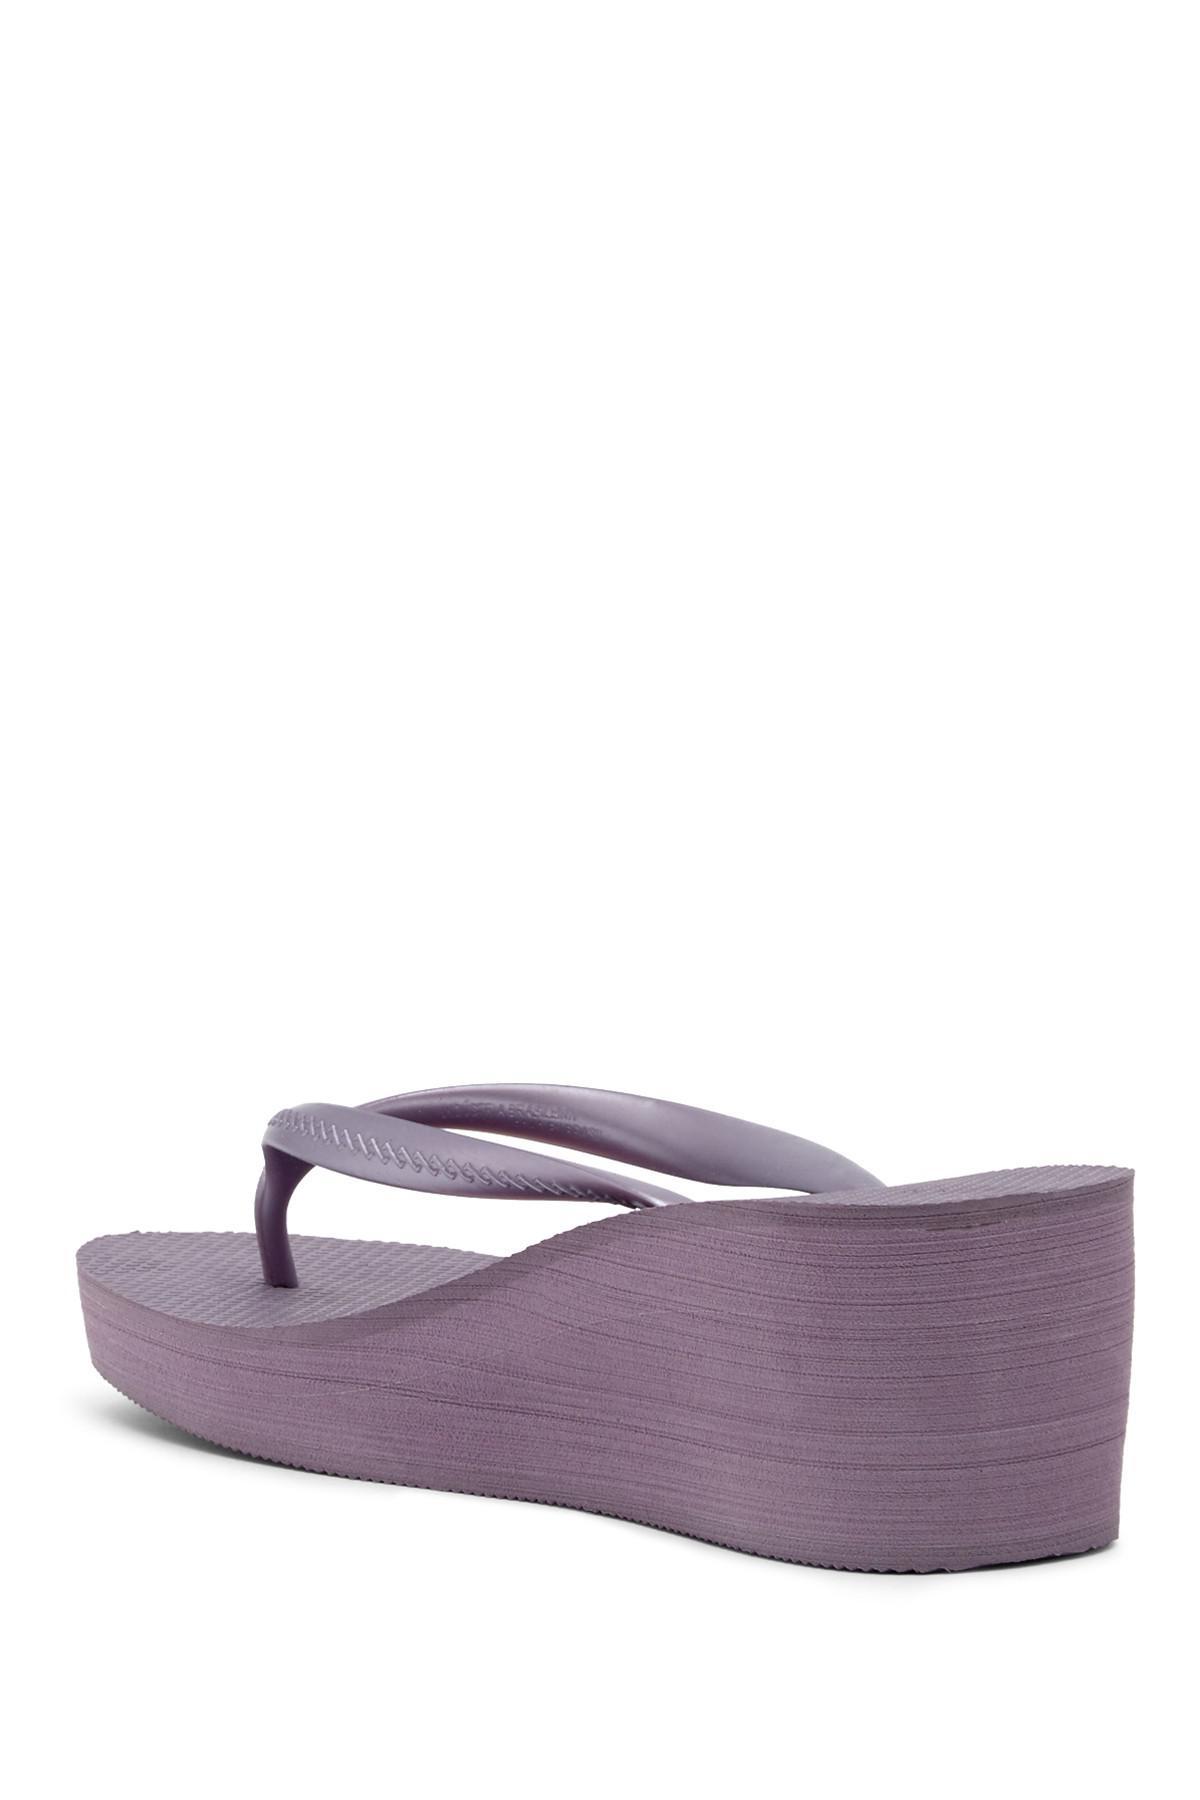 56105600d7067f Lyst - Havaianas High Fashion Platform Wedge Flip Flop Sandal (women ...